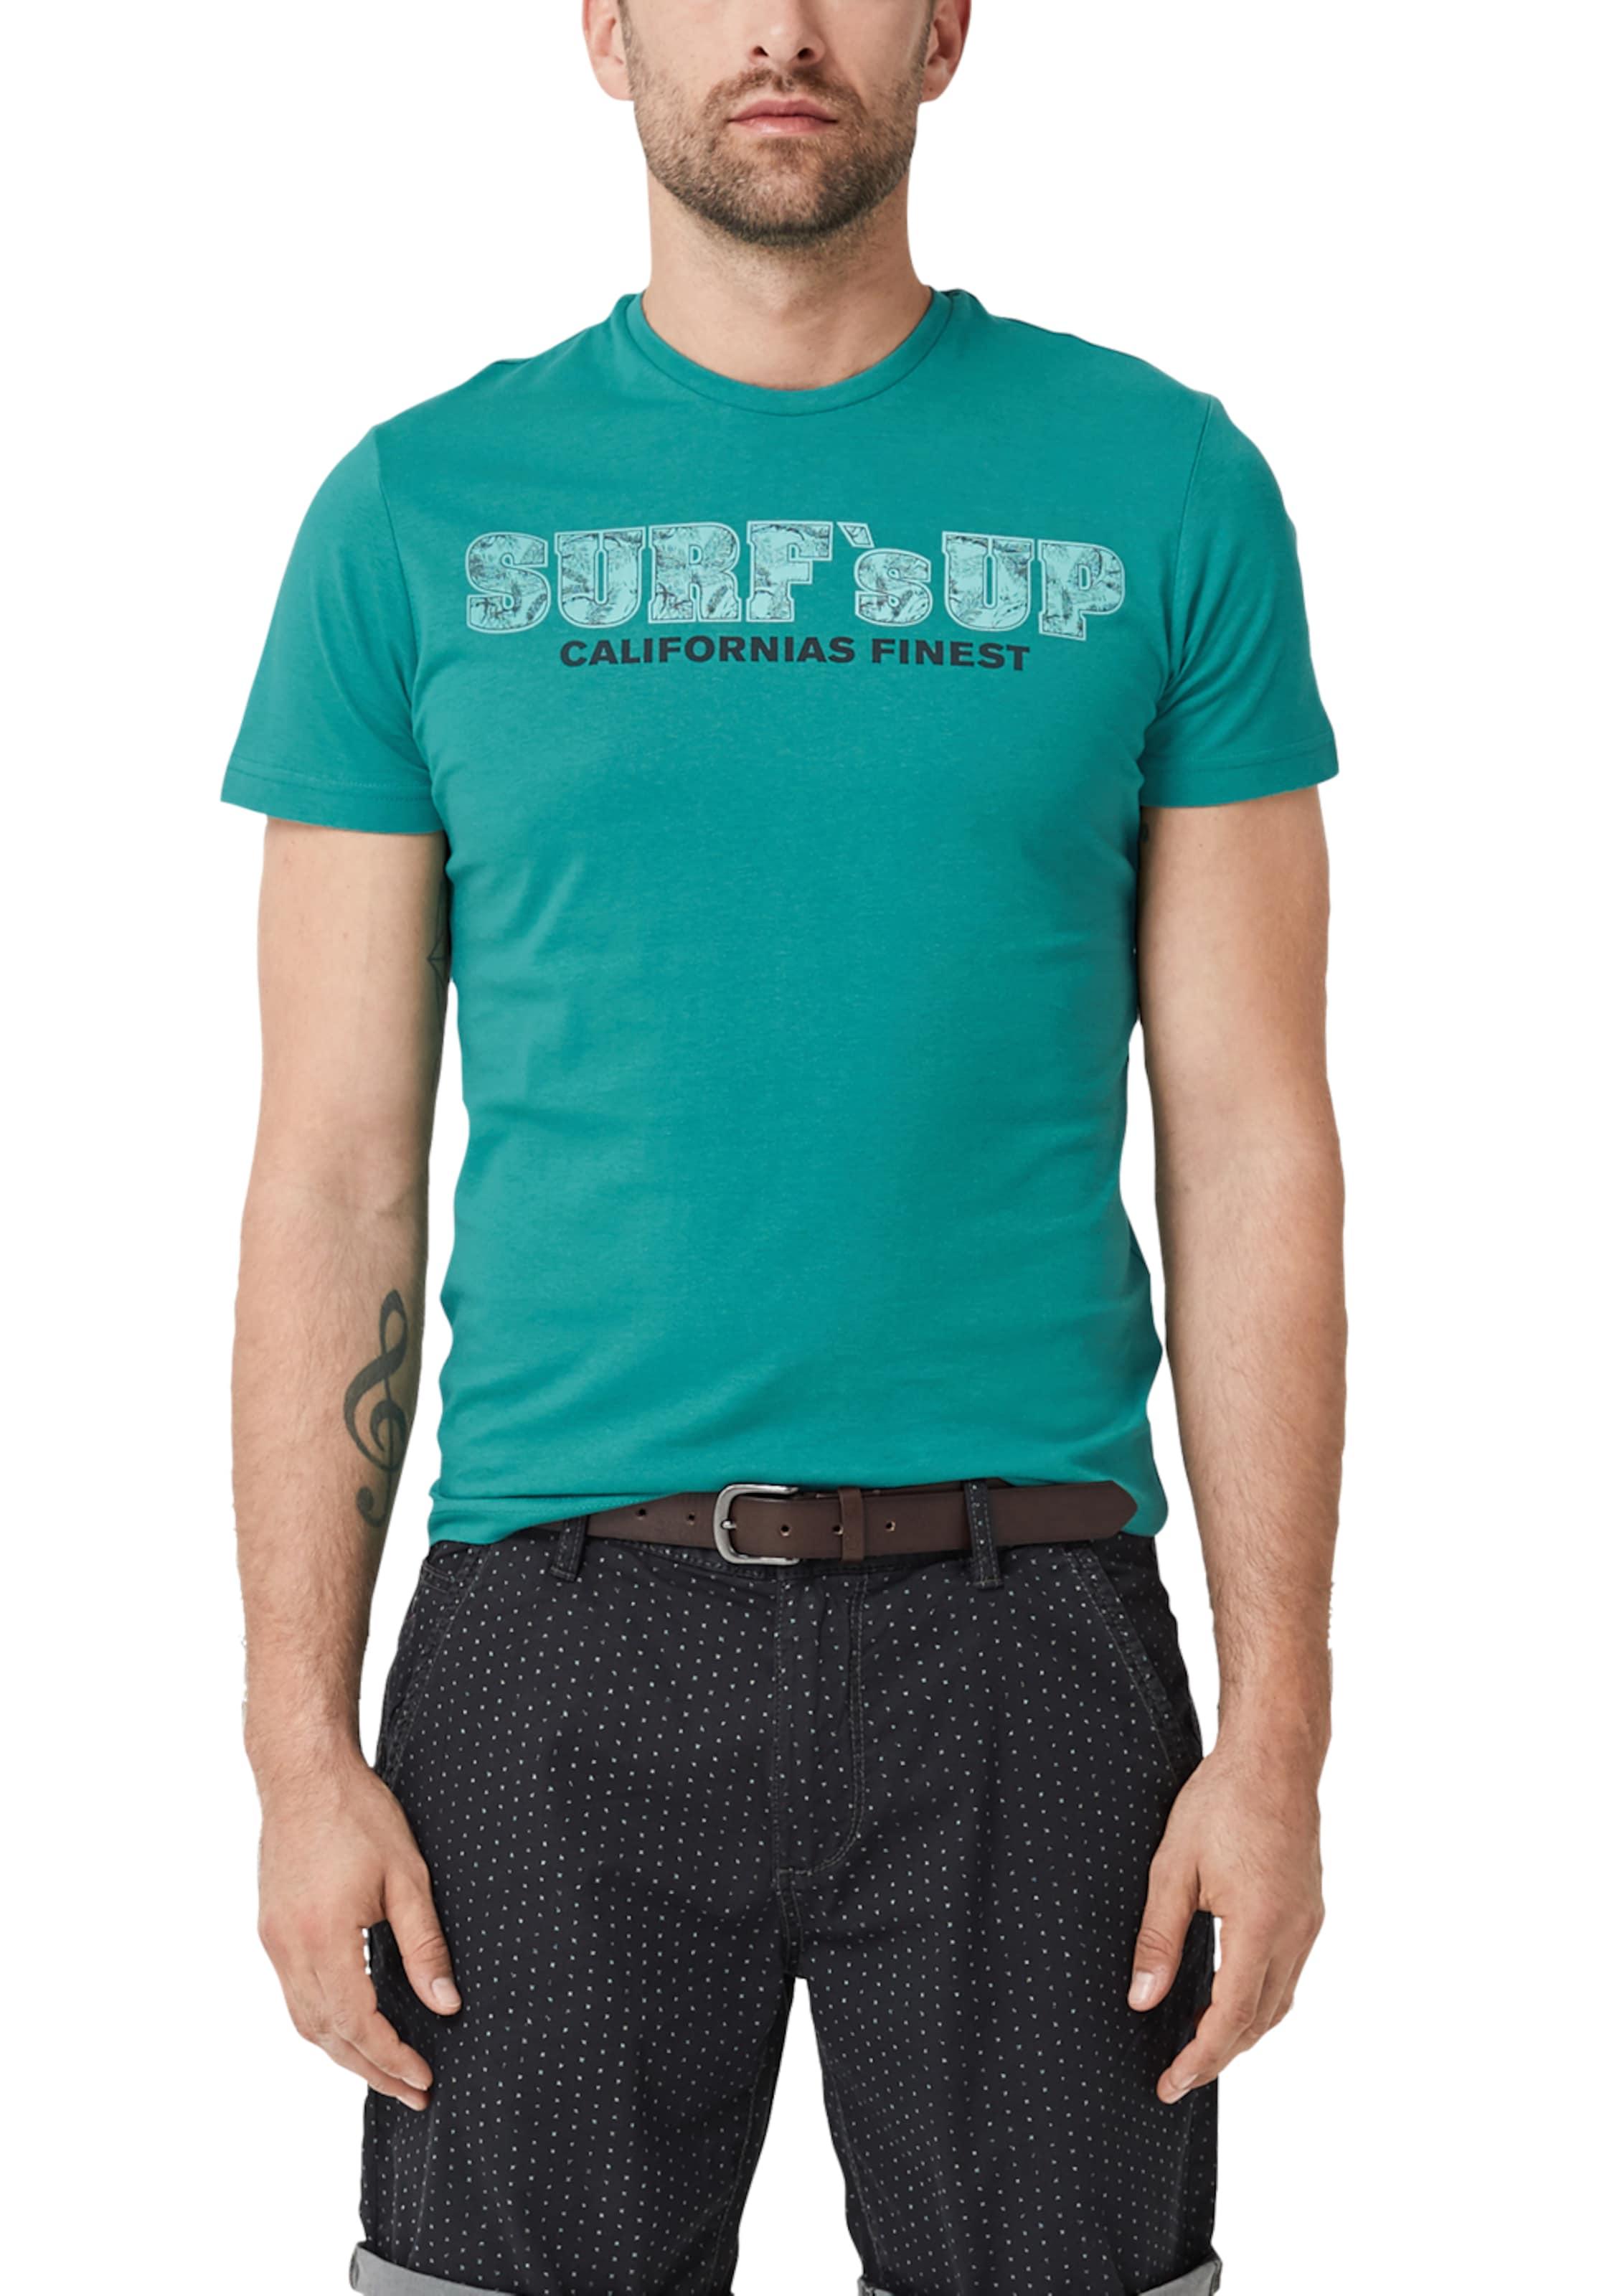 S Himmelblau Shirt oliver Label Red In QrCdBoWeEx